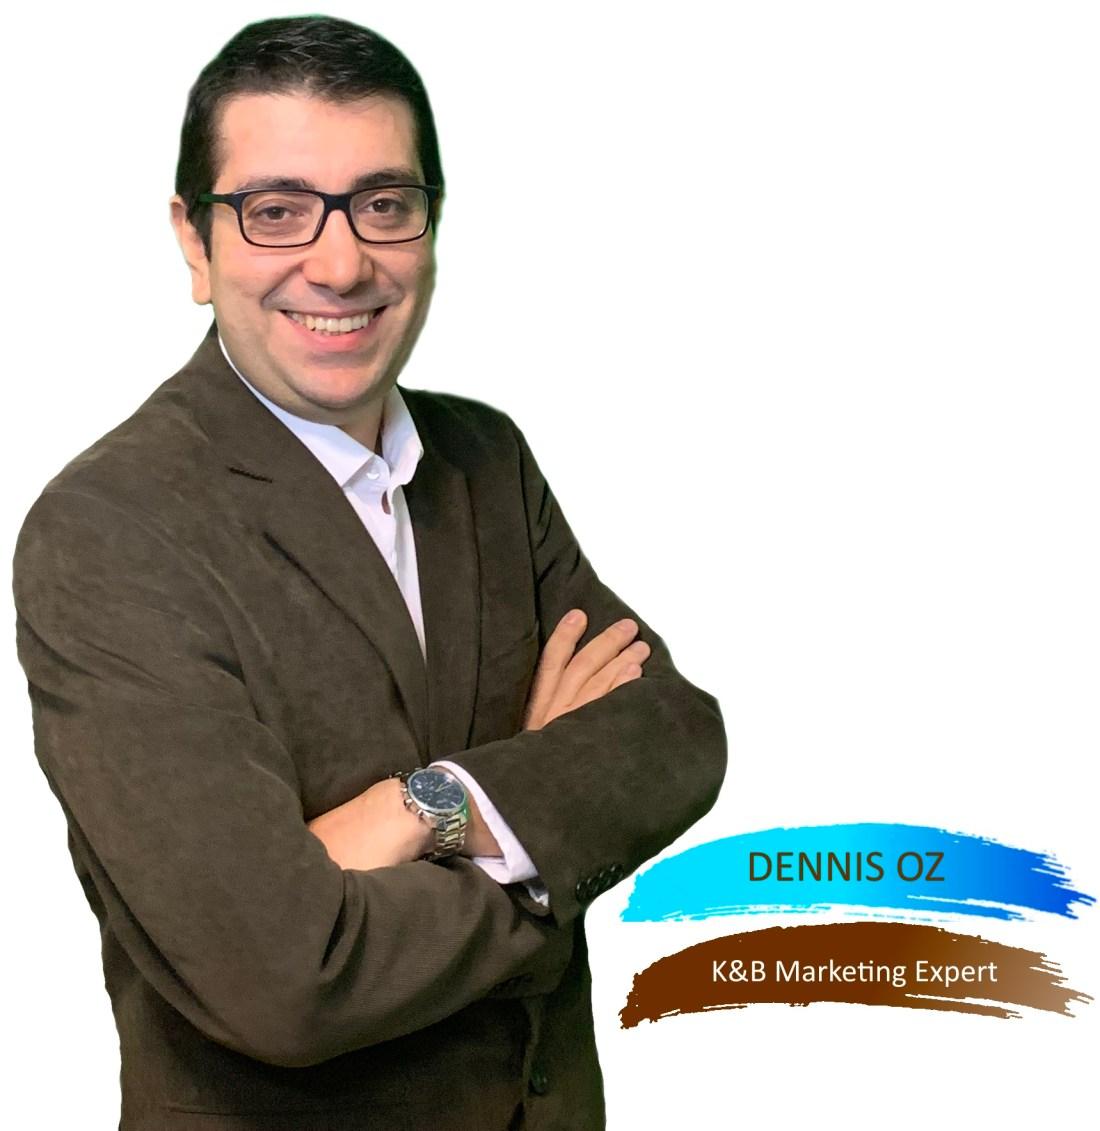 Dennis Oz K&B Marketing Expert